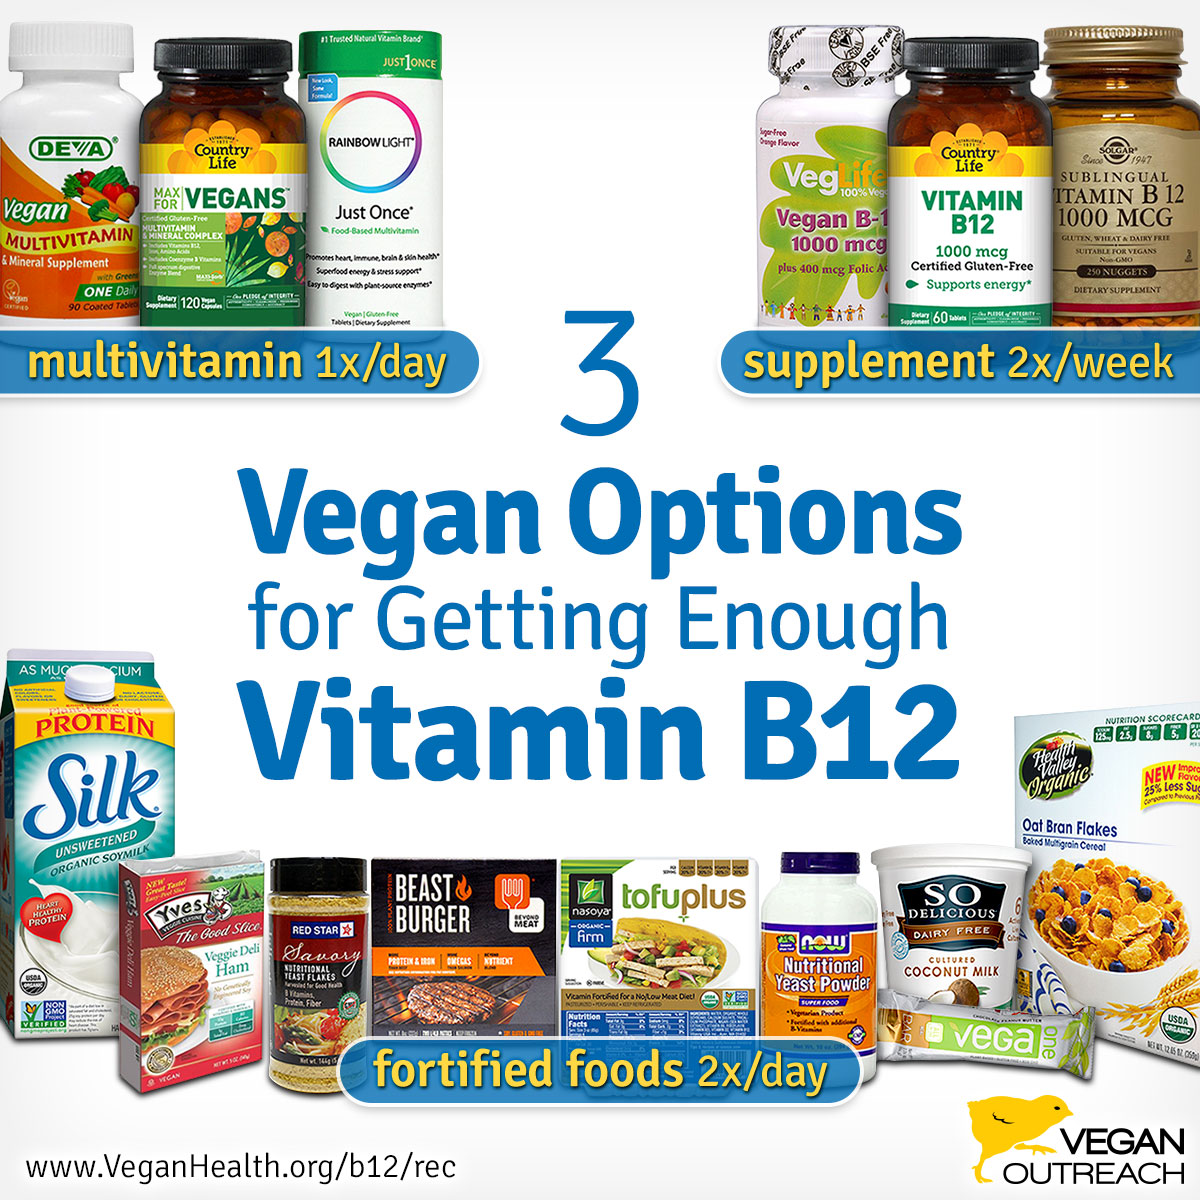 sources of vitamin b12 in vegan diet